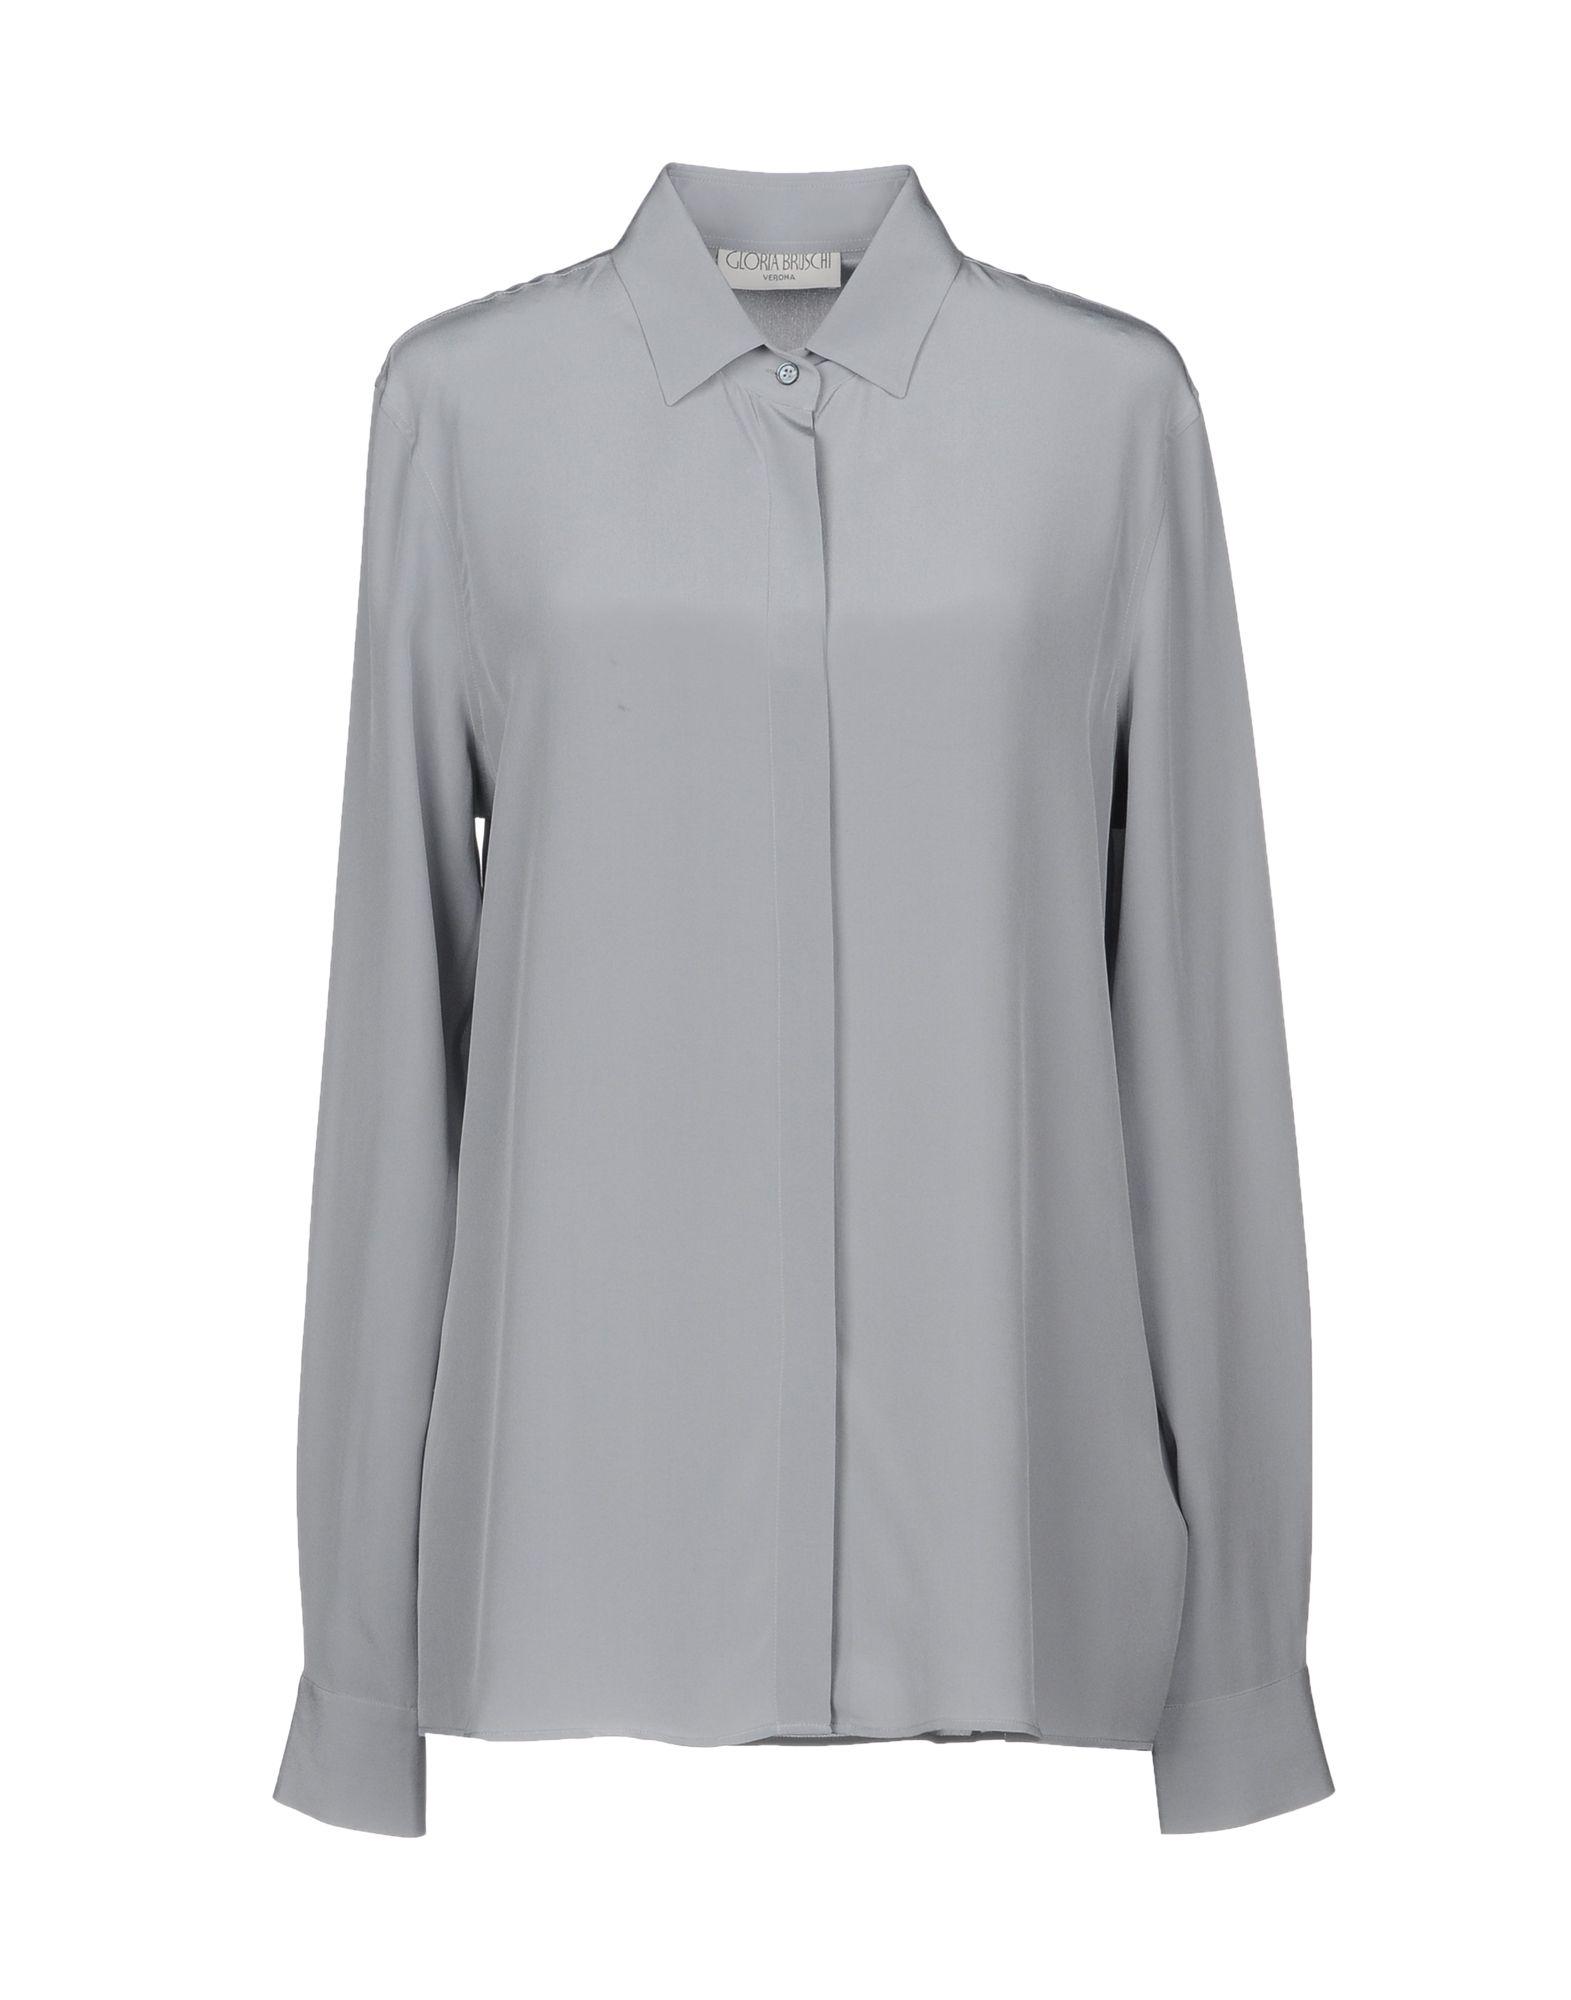 detailed pictures acd0c 0c7ae GLORIA BRUSCHI VERONA Silk shirts & blouses - Shirts | YOOX.COM